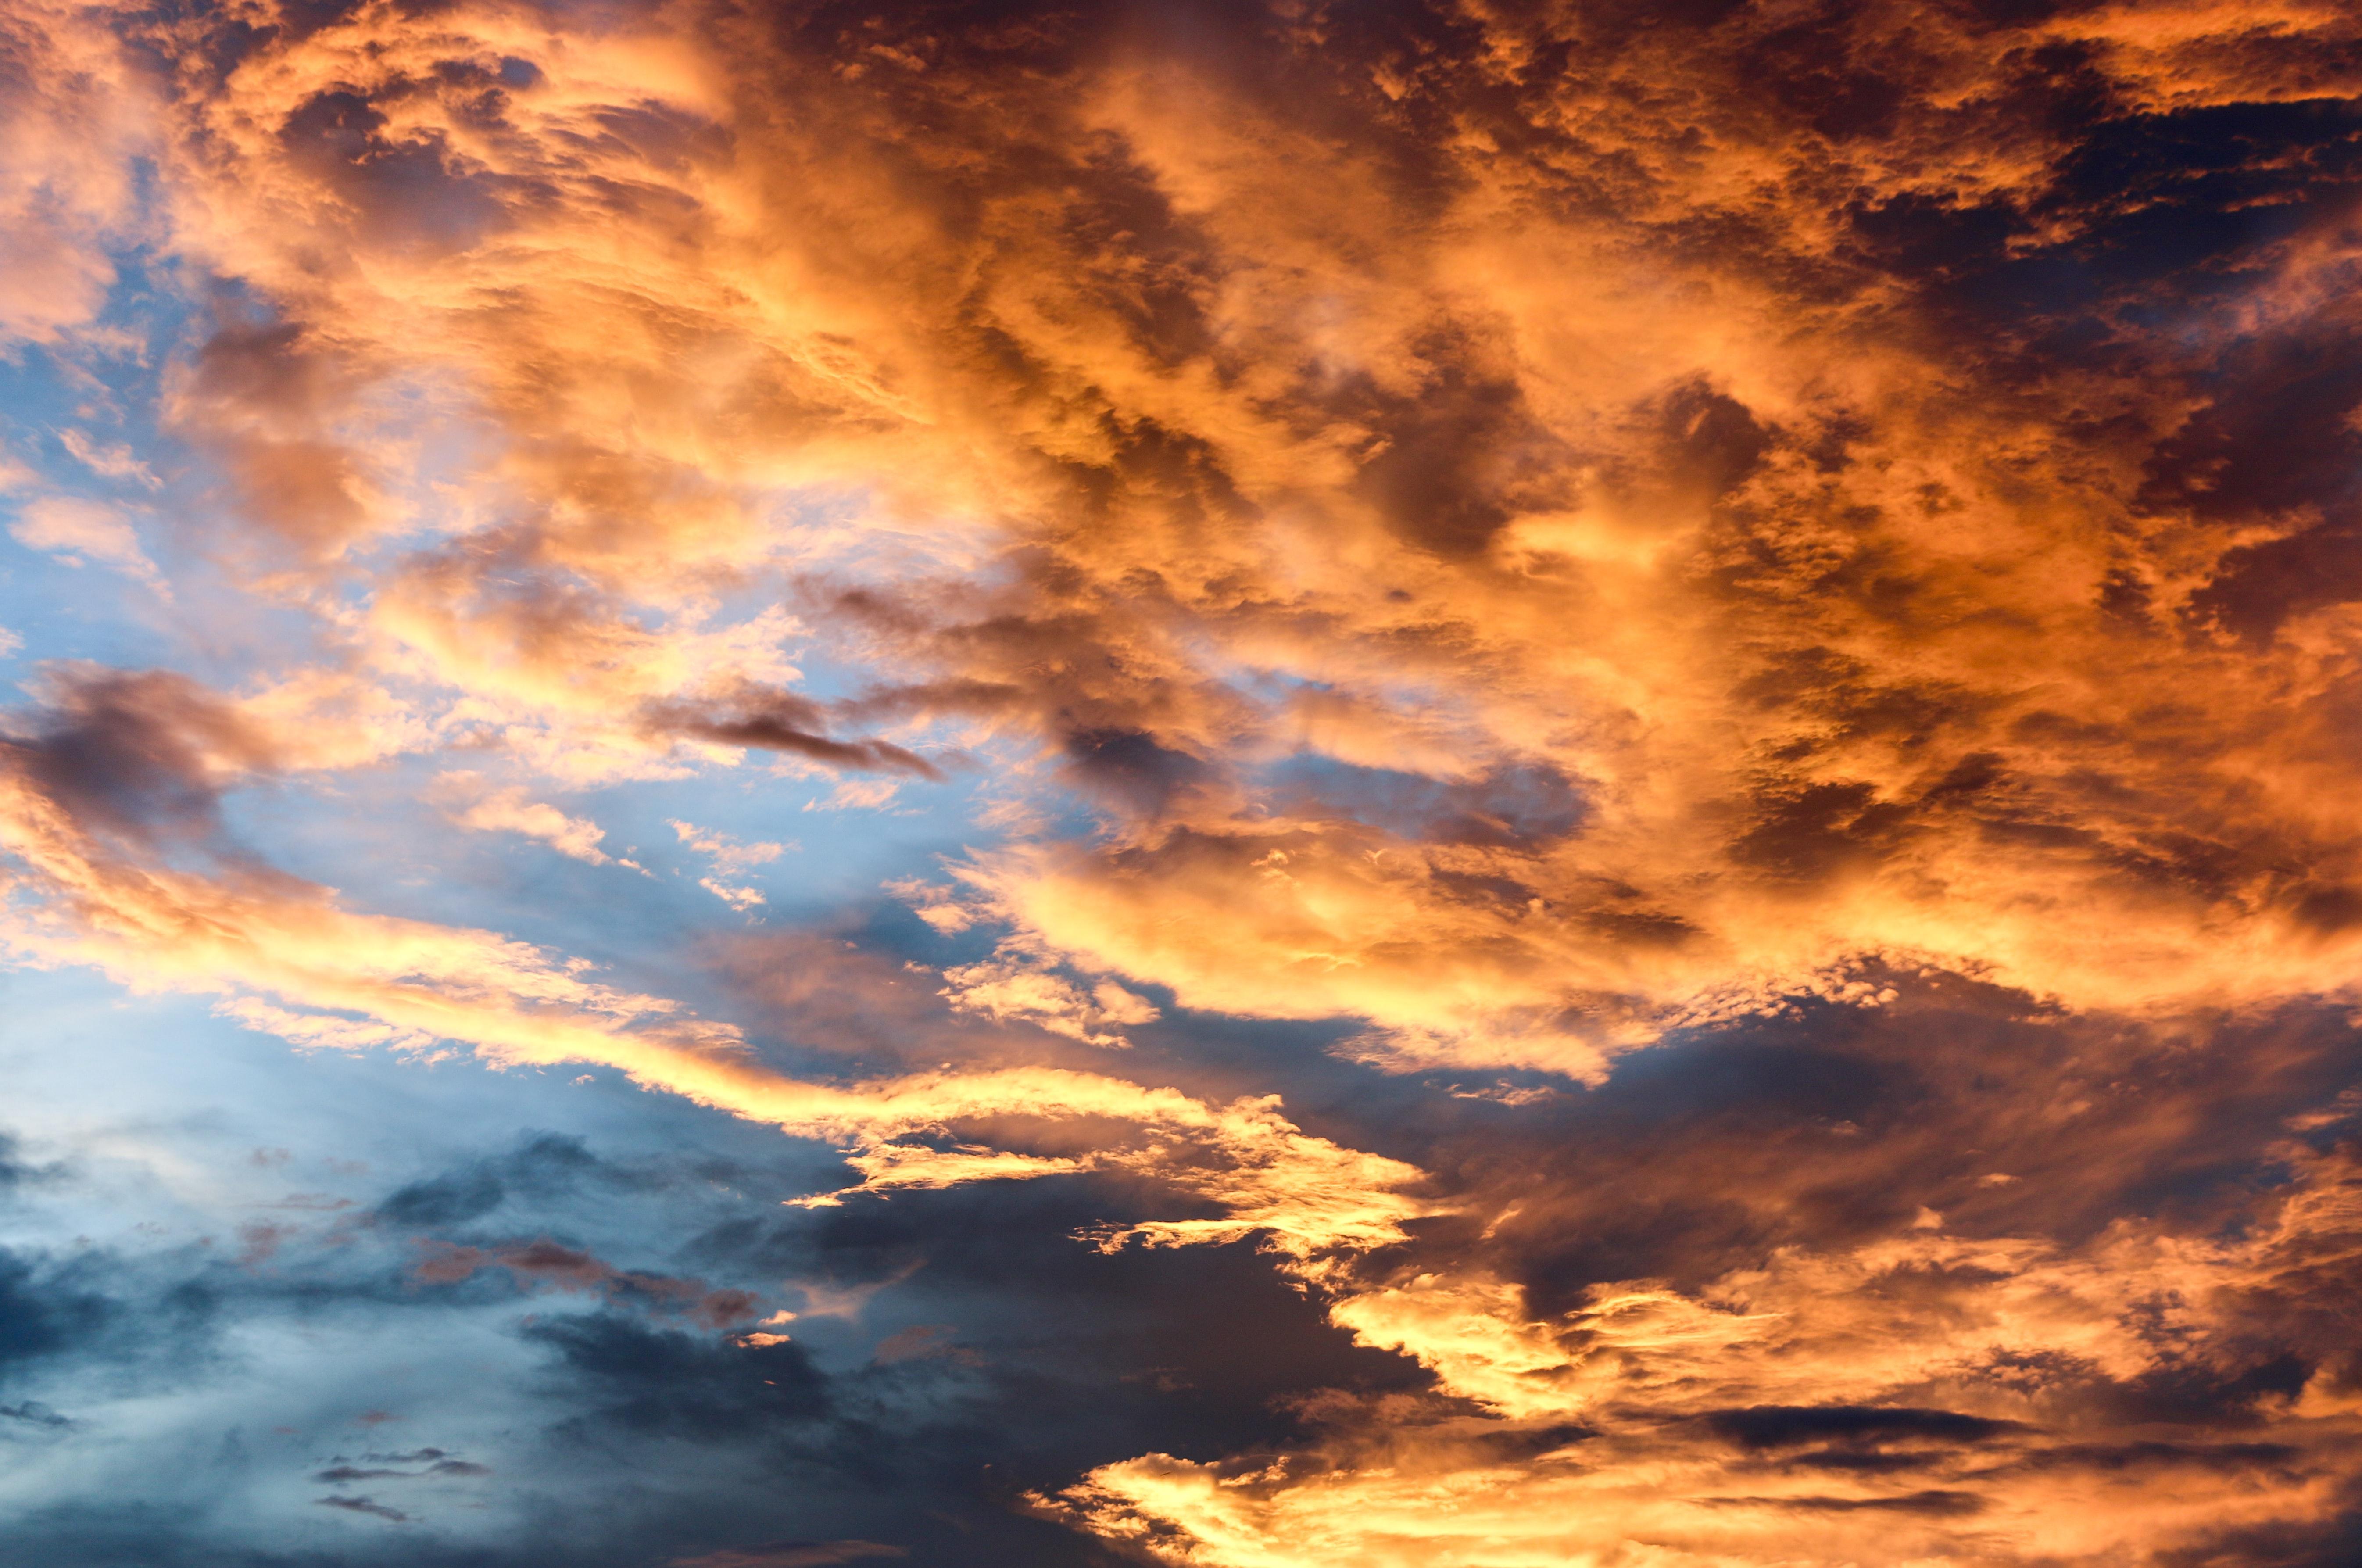 sunset wallpaper,sky,cloud,afterglow,daytime,nature